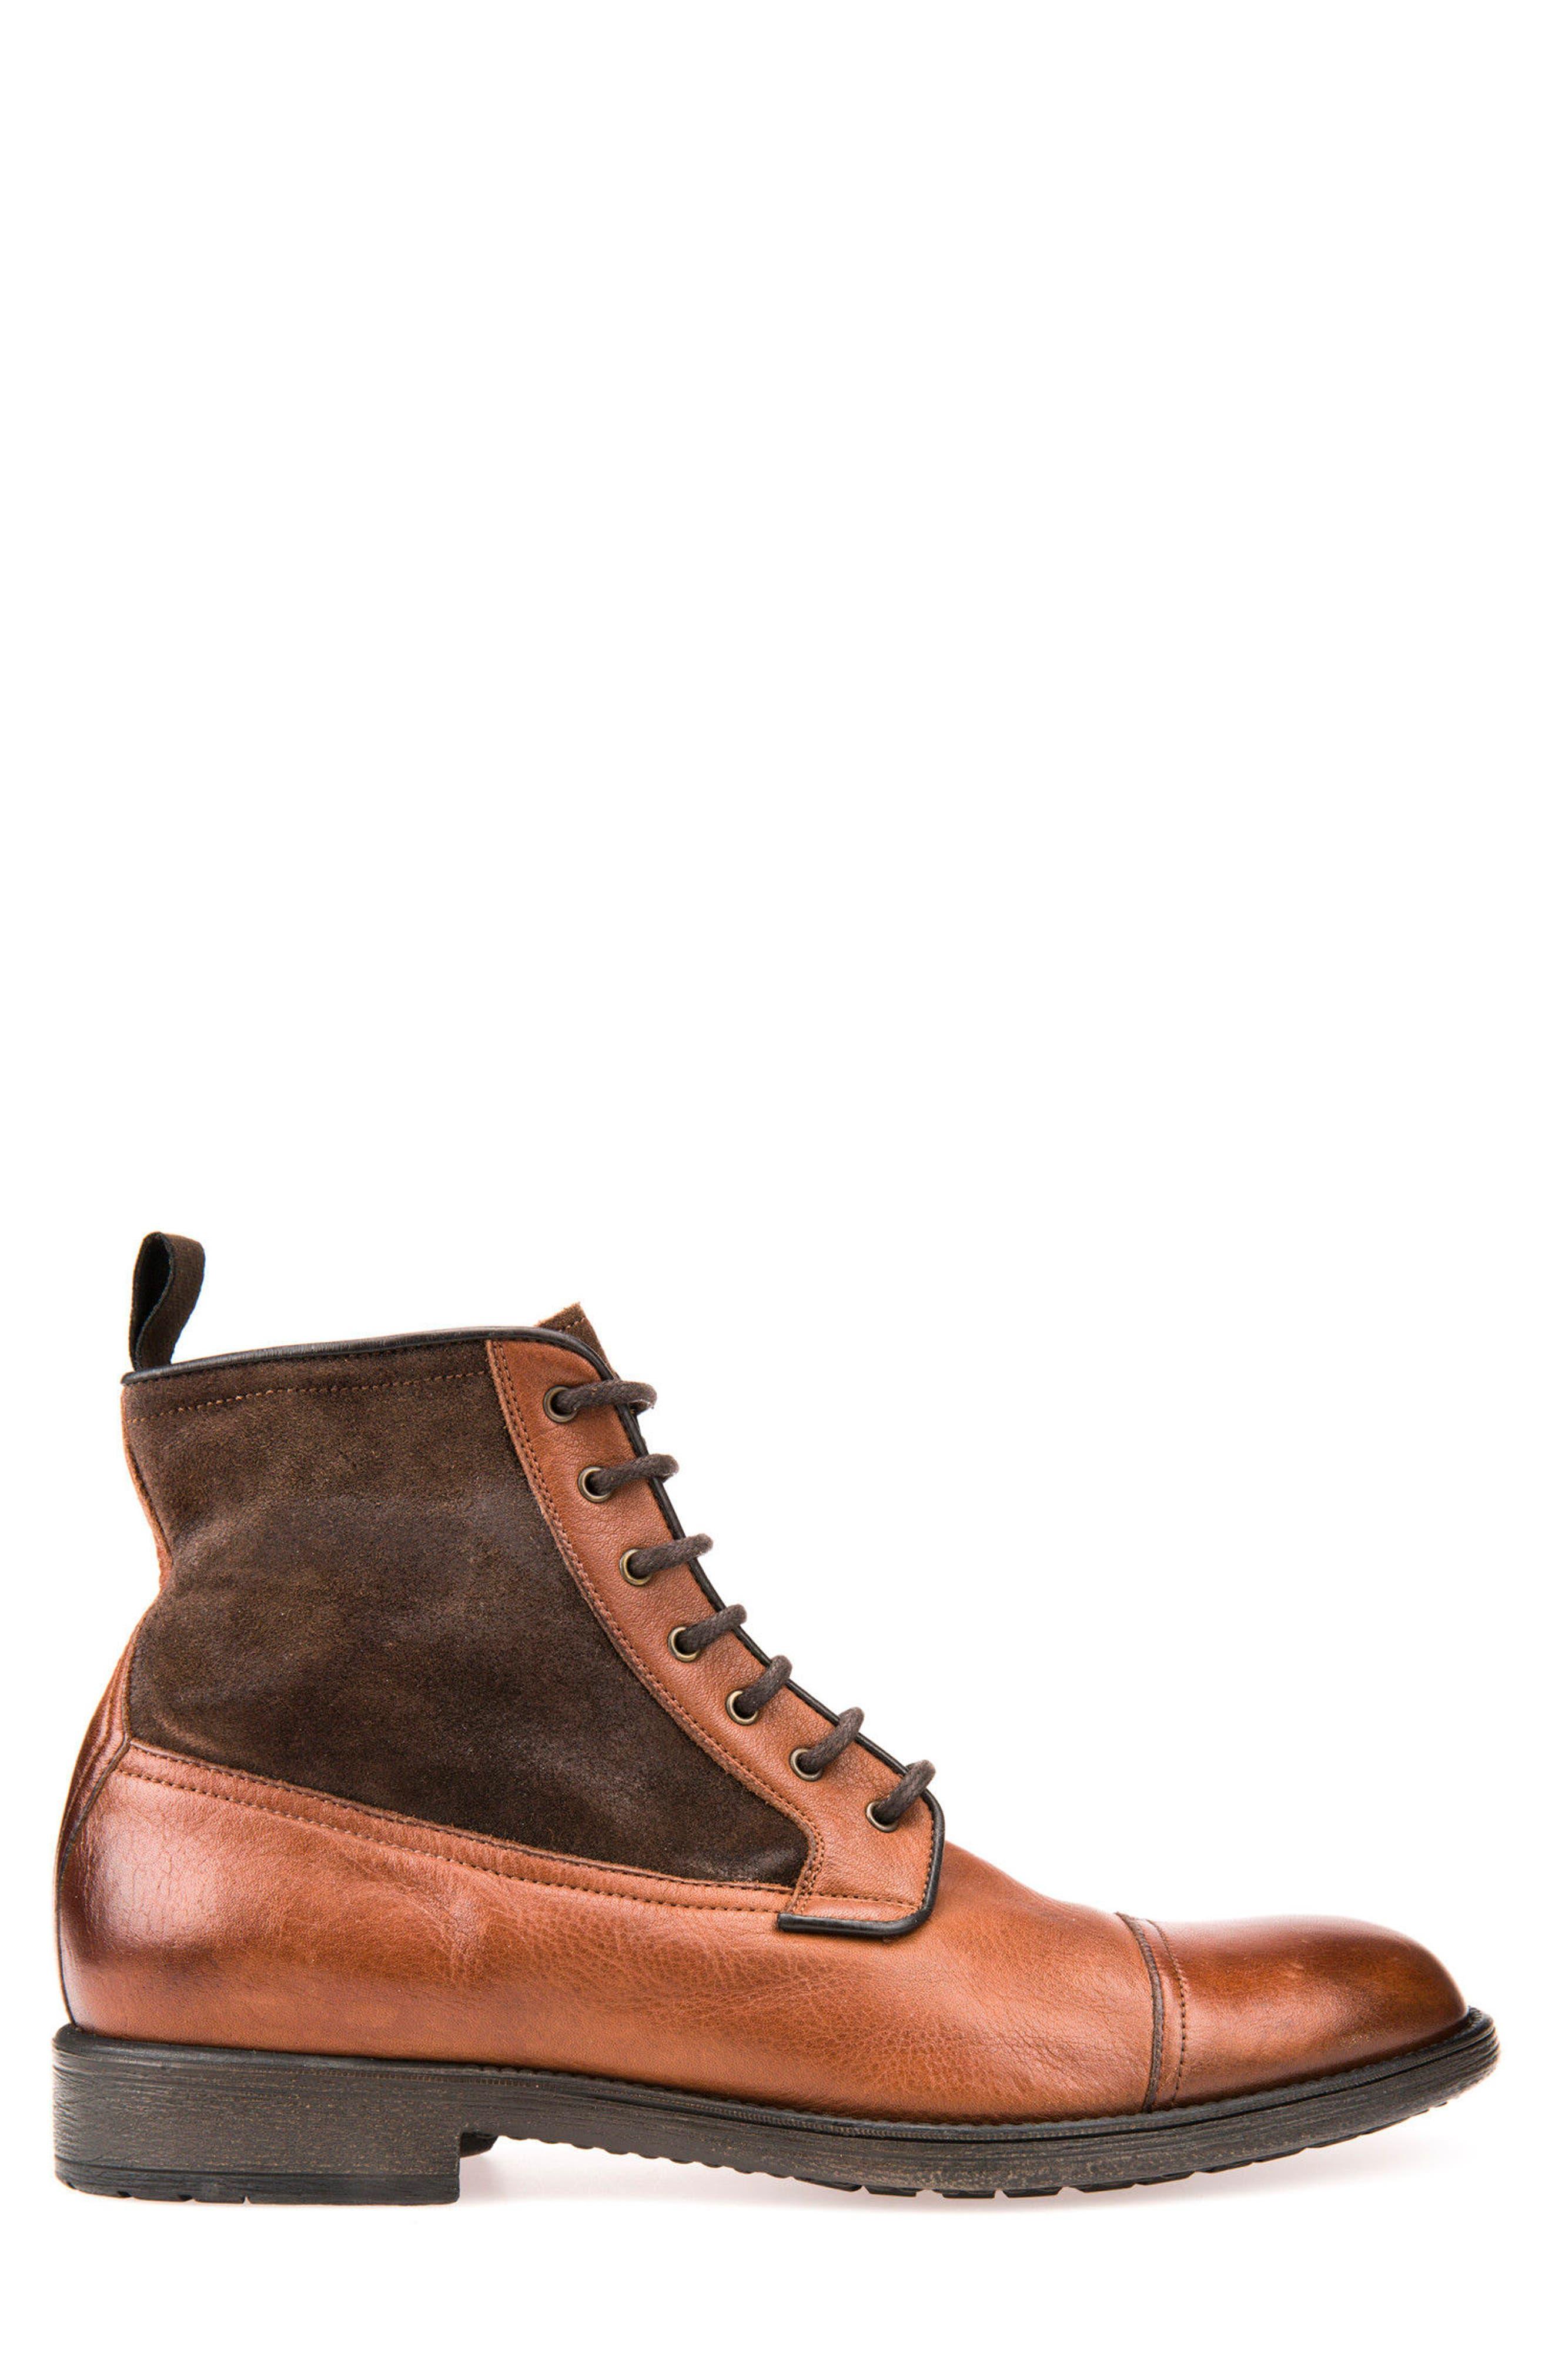 Jaylon 12 Cap-Toe Boot,                             Alternate thumbnail 3, color,                             Ebony